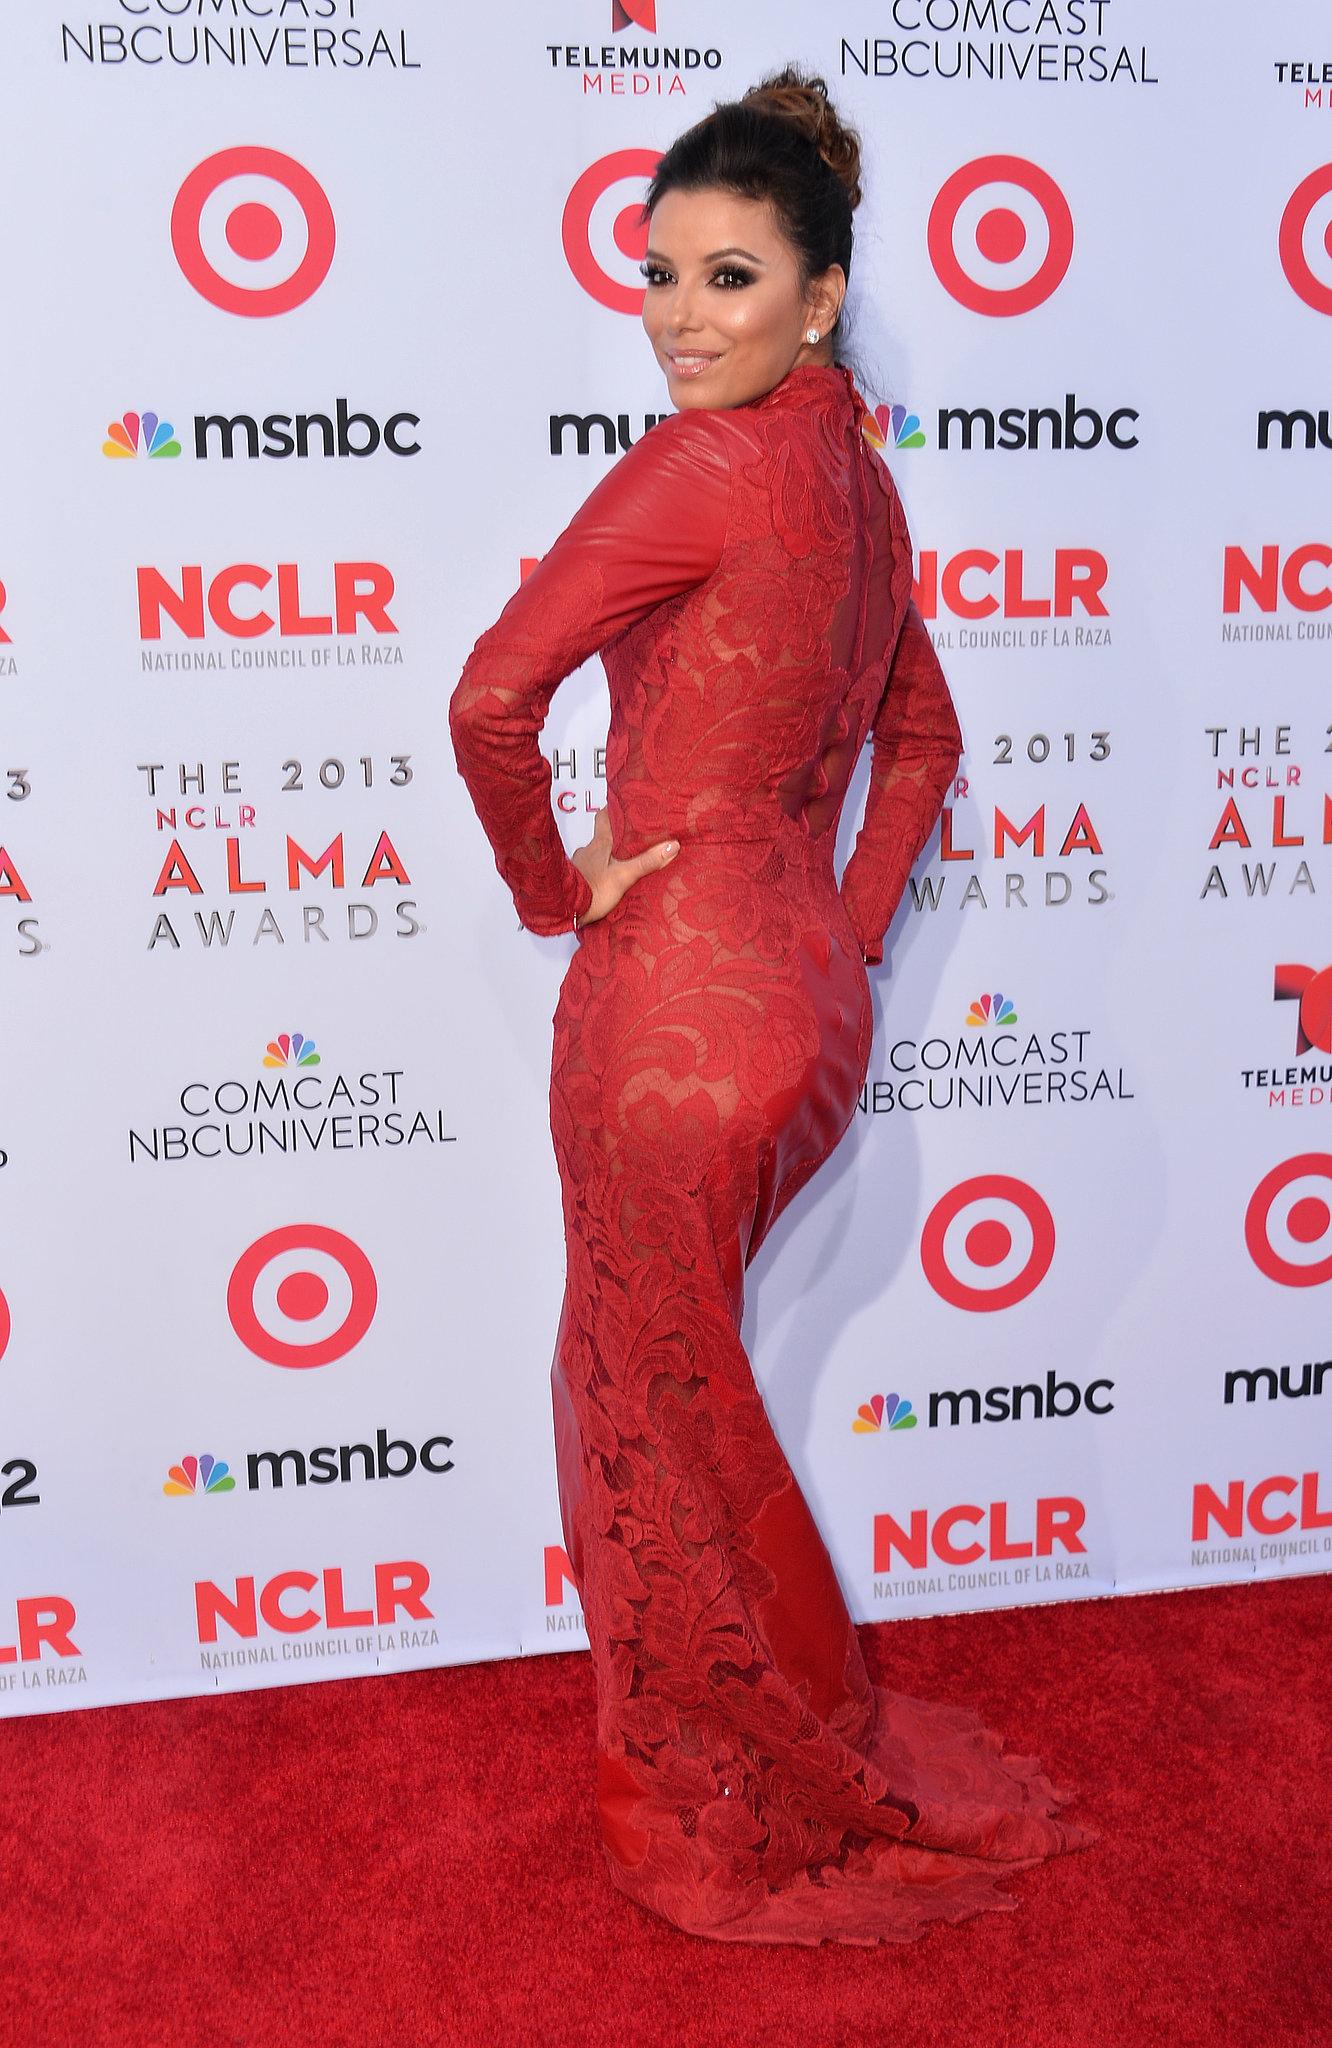 Eva Longoria wore fiery crimson dress red carpet 3a547